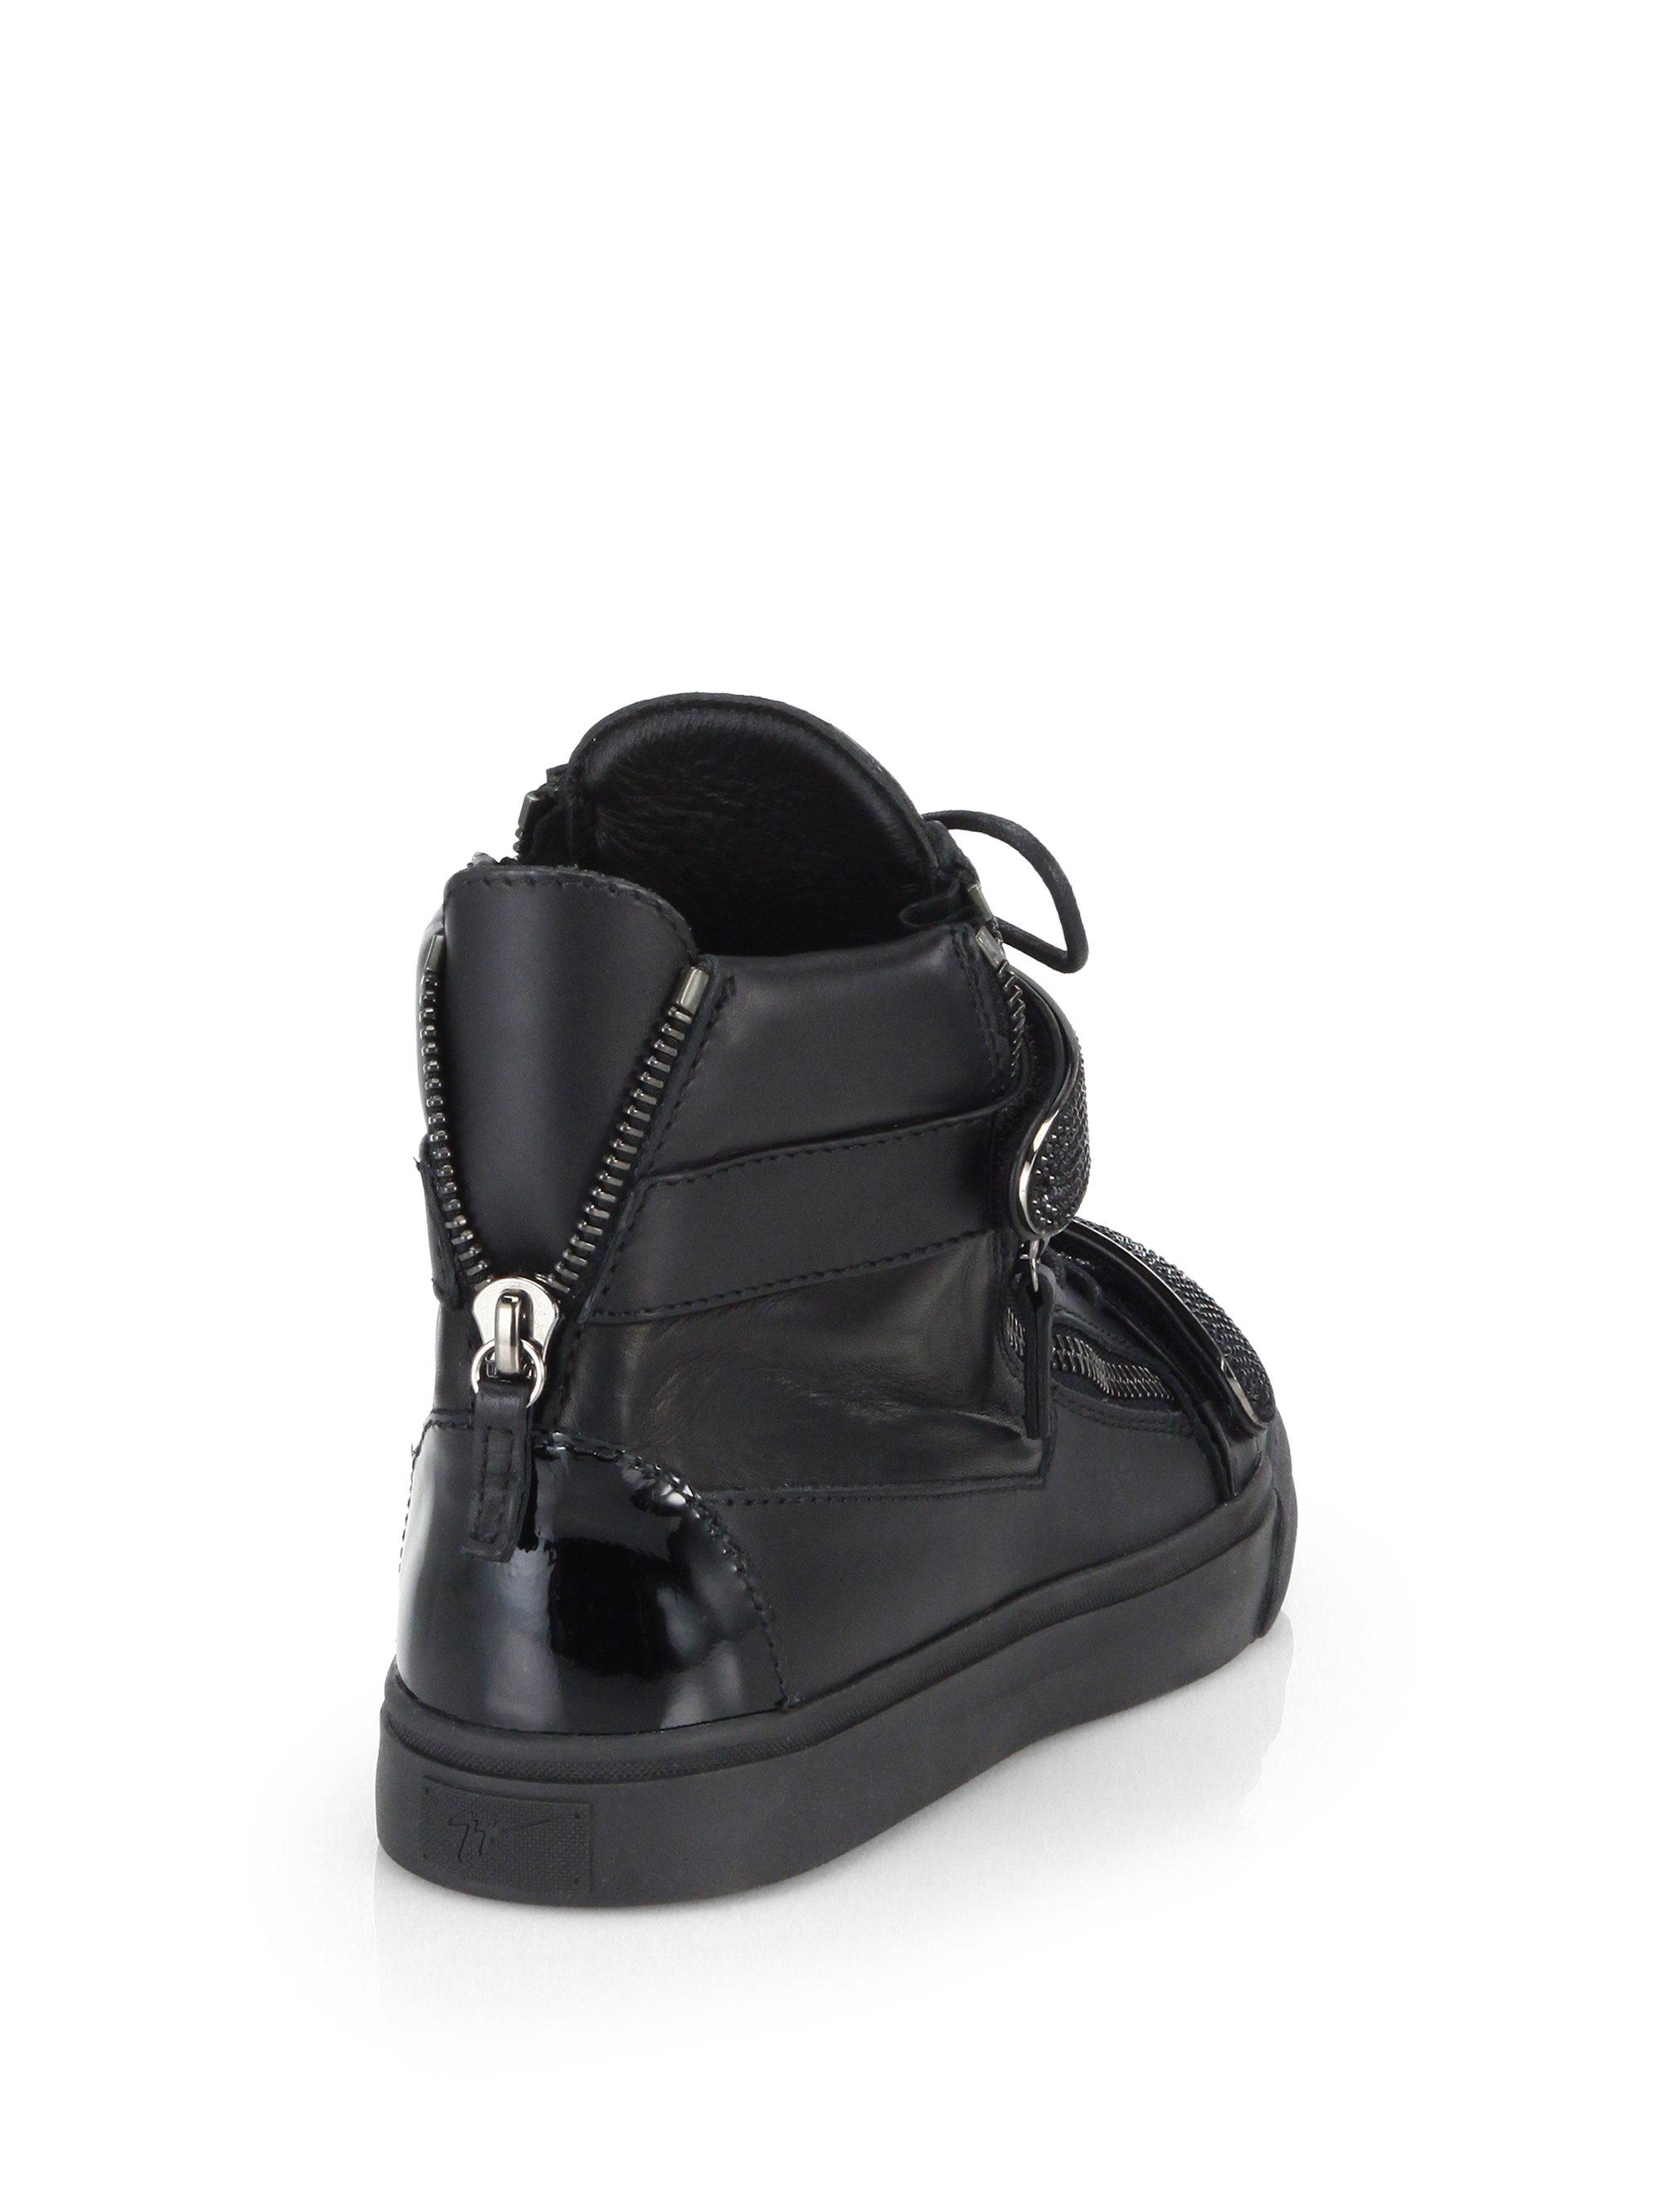 textured sneakers - Black Giuseppe Zanotti yXamqm